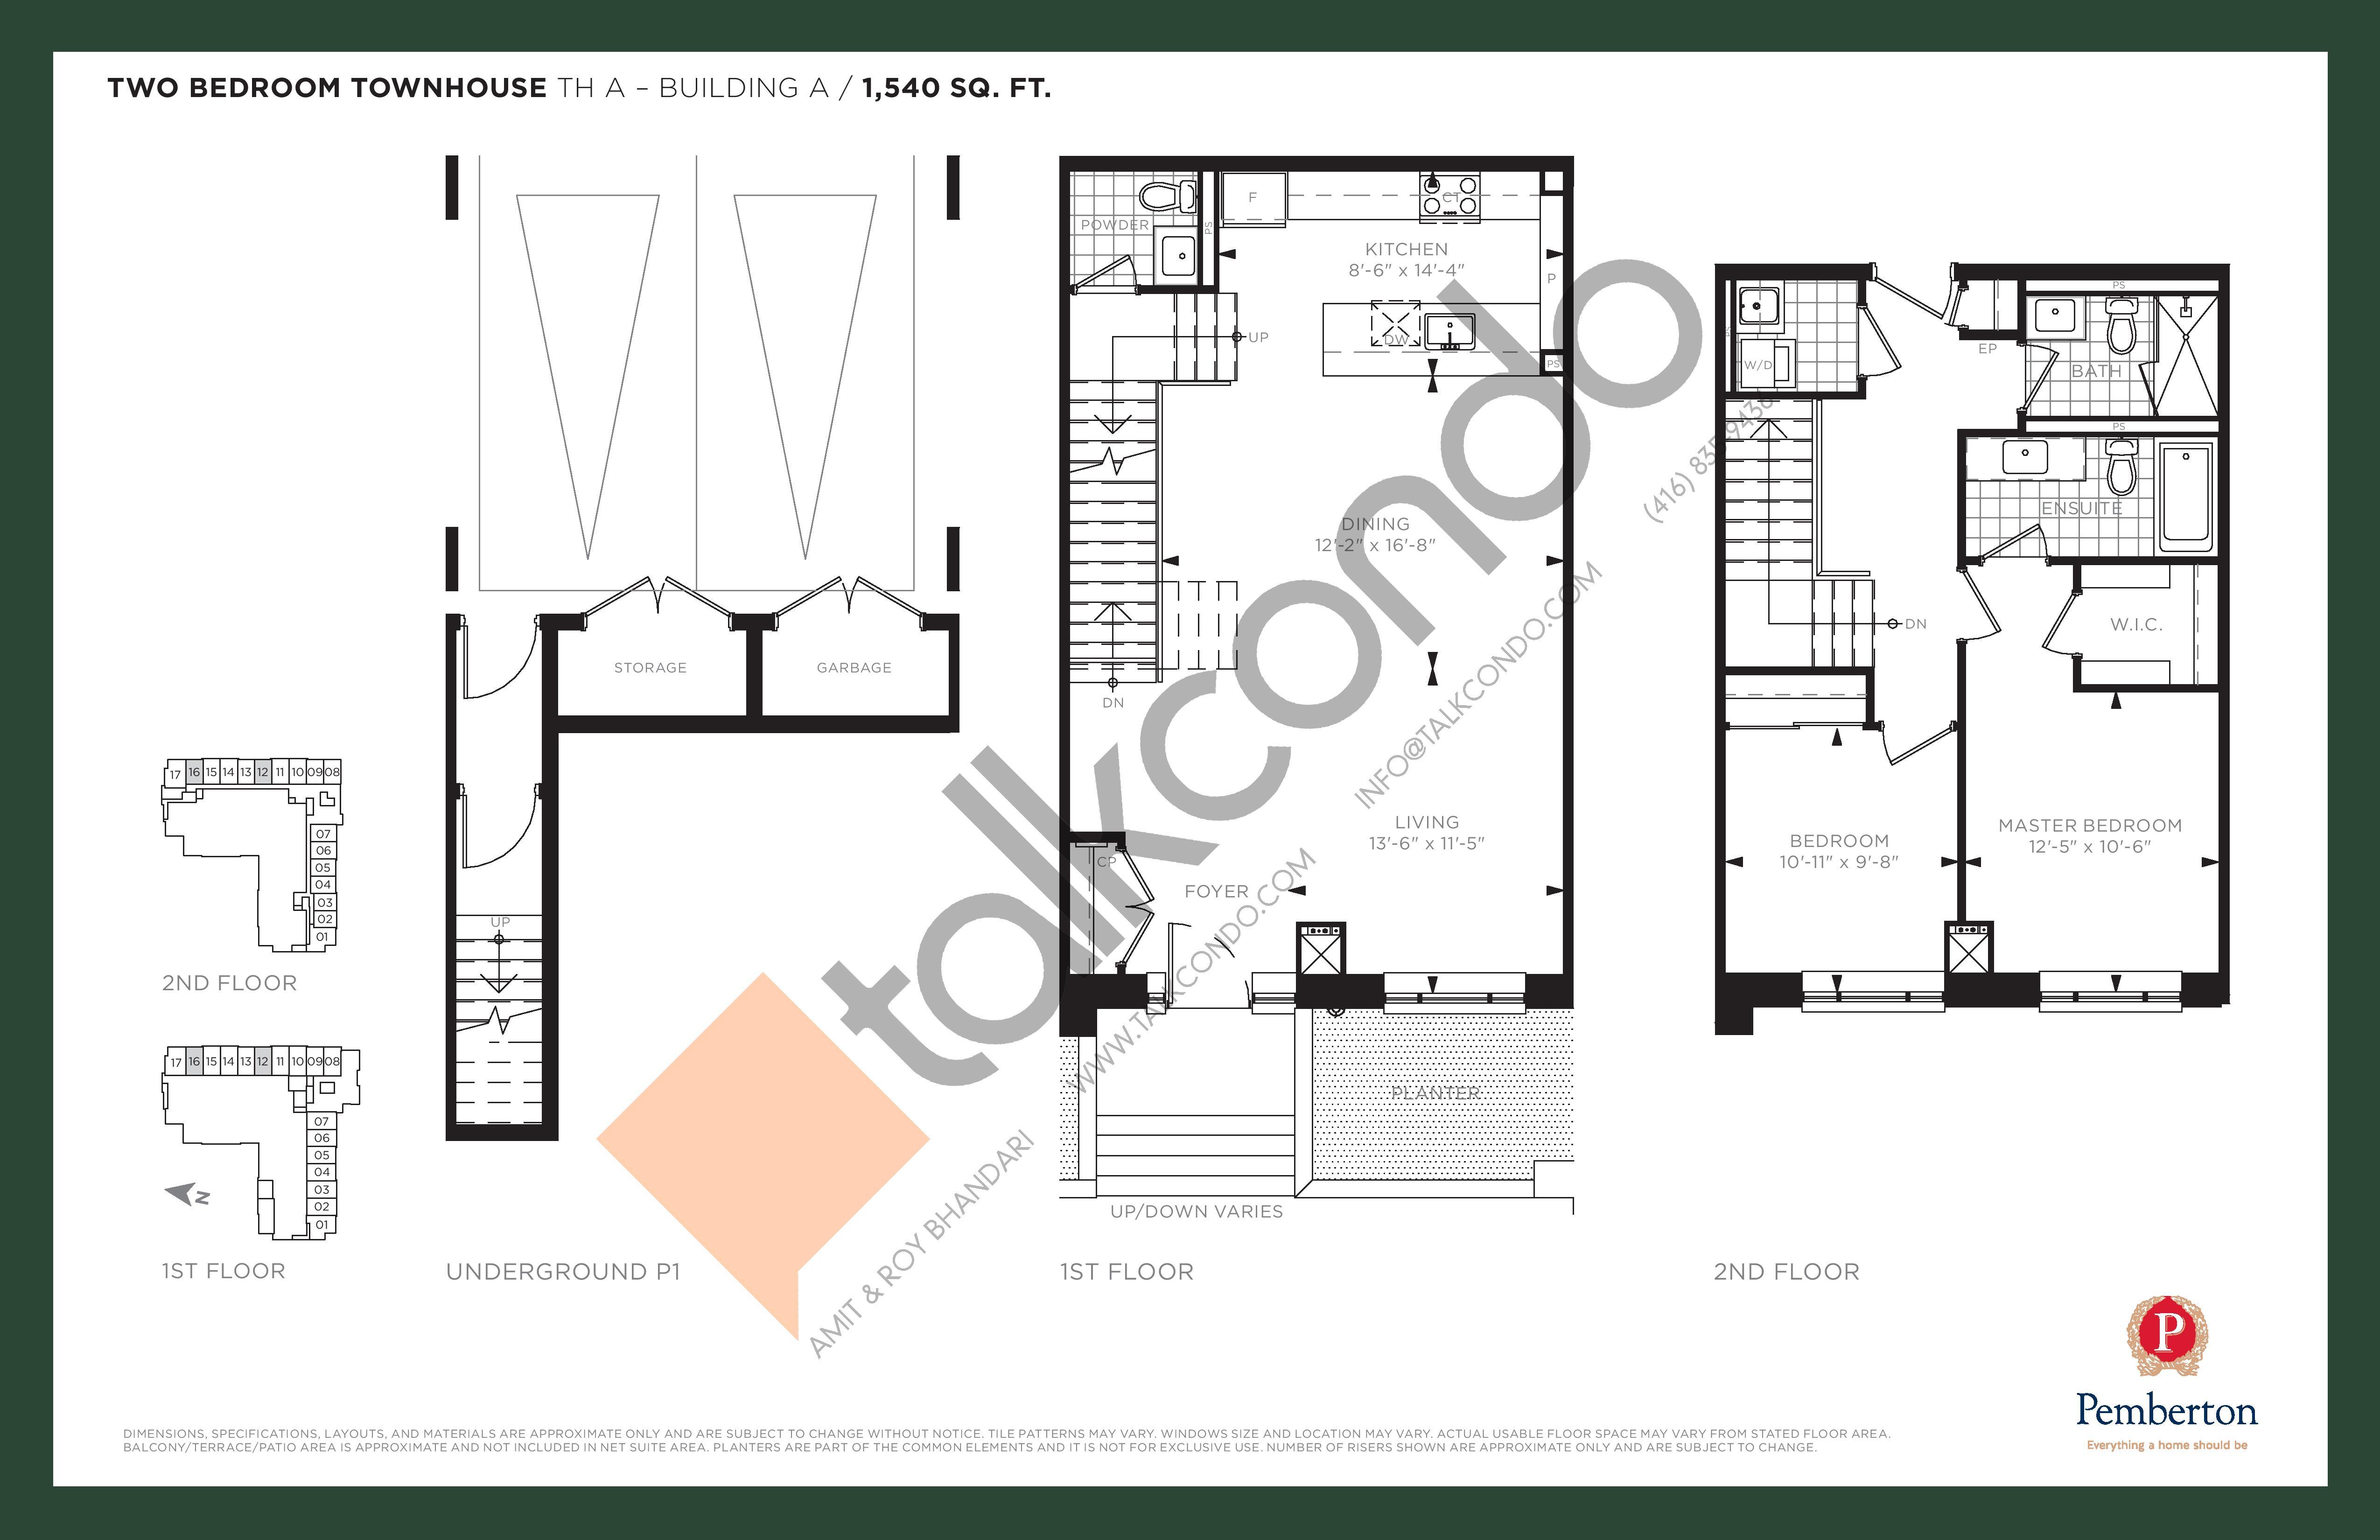 TH A - Building A Floor Plan at 9th & Main Condos + Towns - 1540 sq.ft